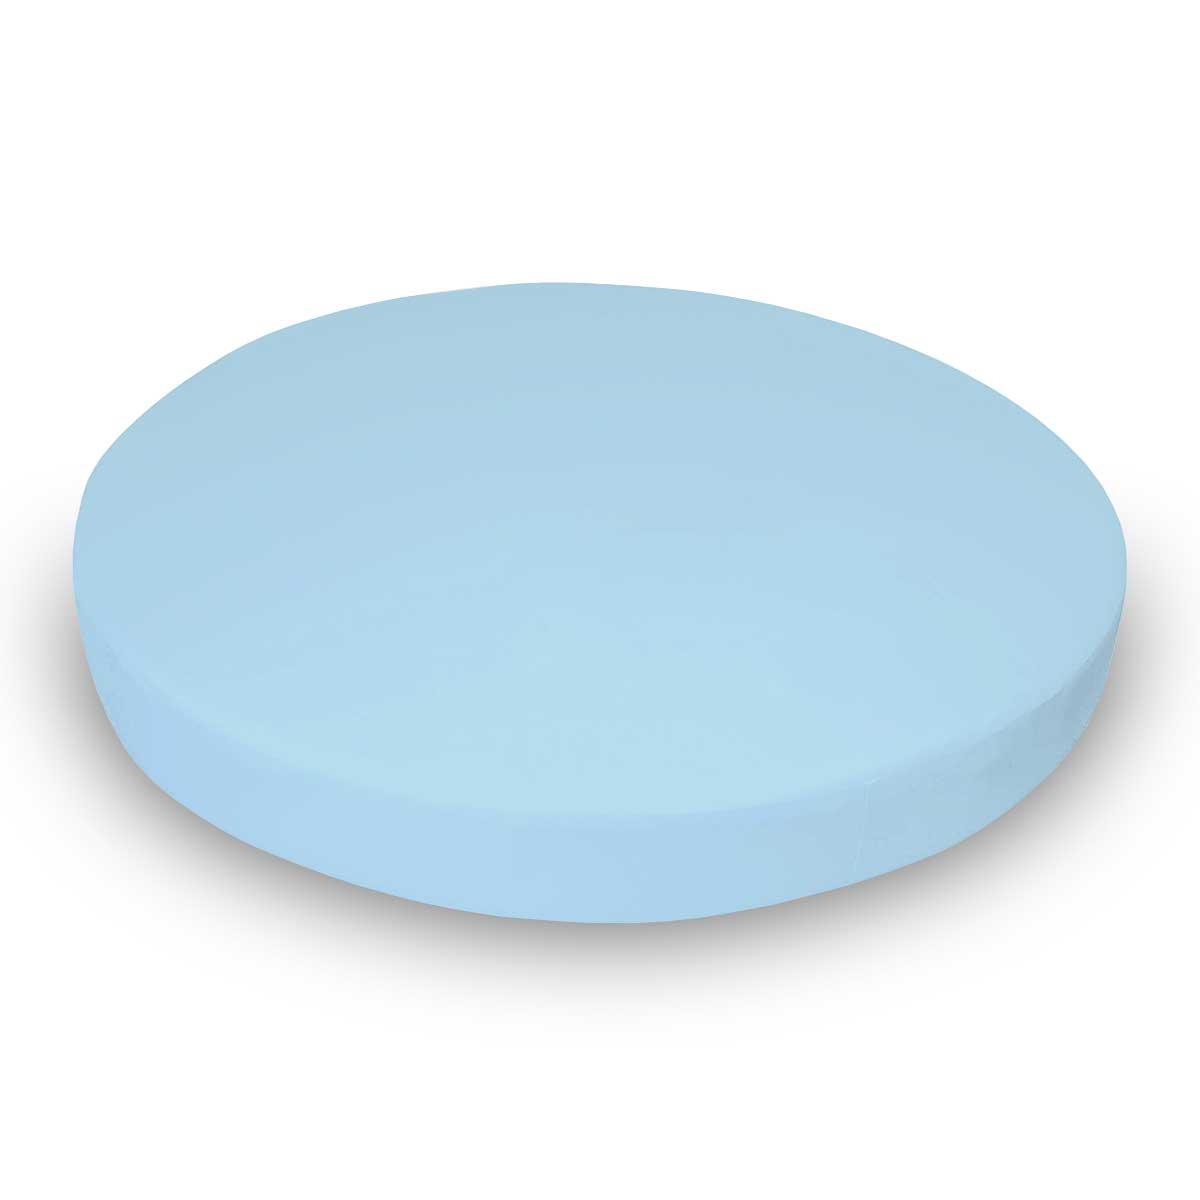 Flannel FS9 - Aqua blue